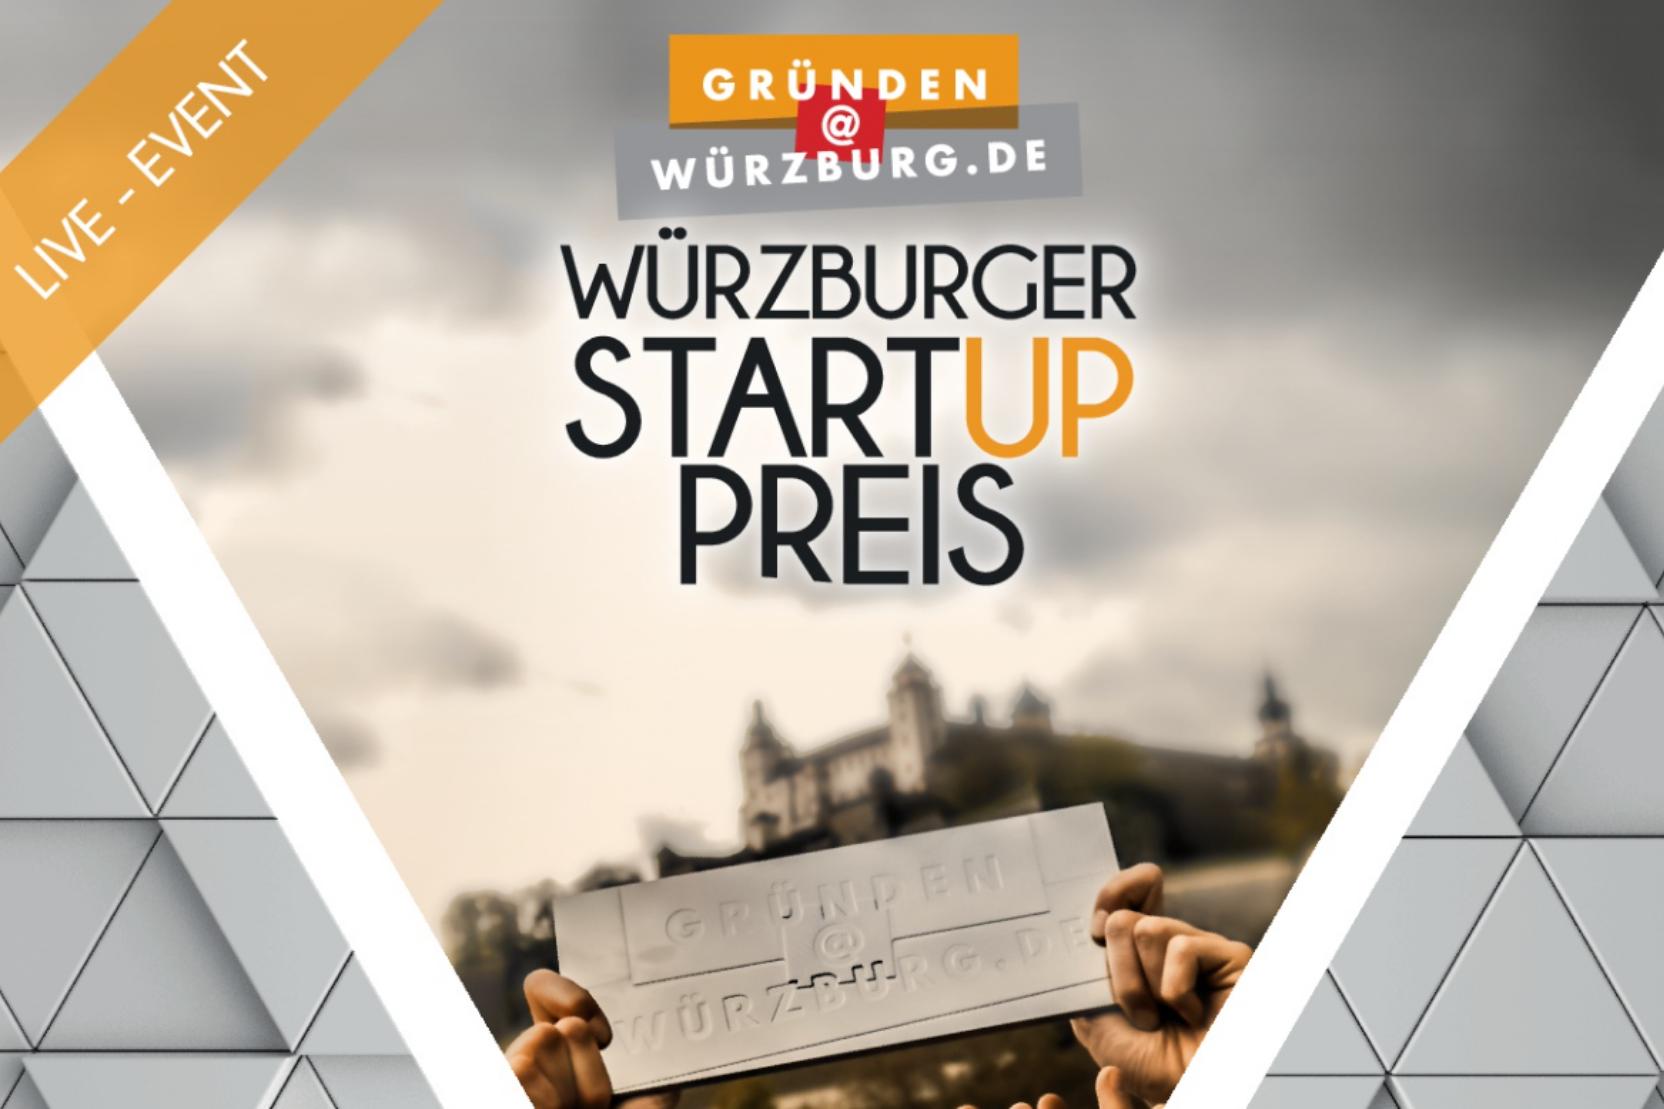 Würzburger Startup-Preis